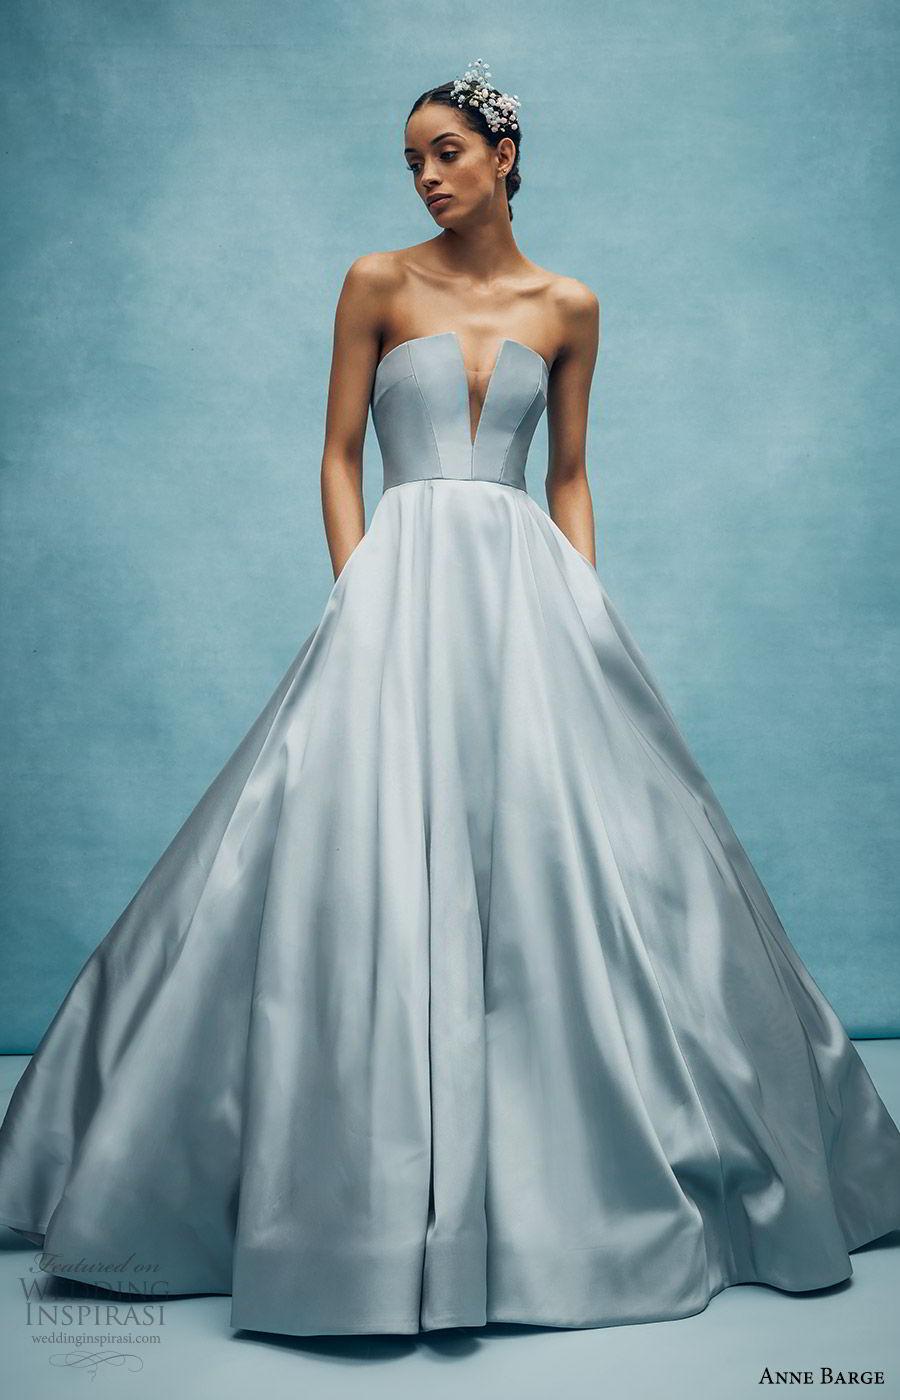 anne barge spring 2020 bridal strapless straight across split v neckline a line ball gown wedding dress (4) elegant minimal modern chapel train blue color mv